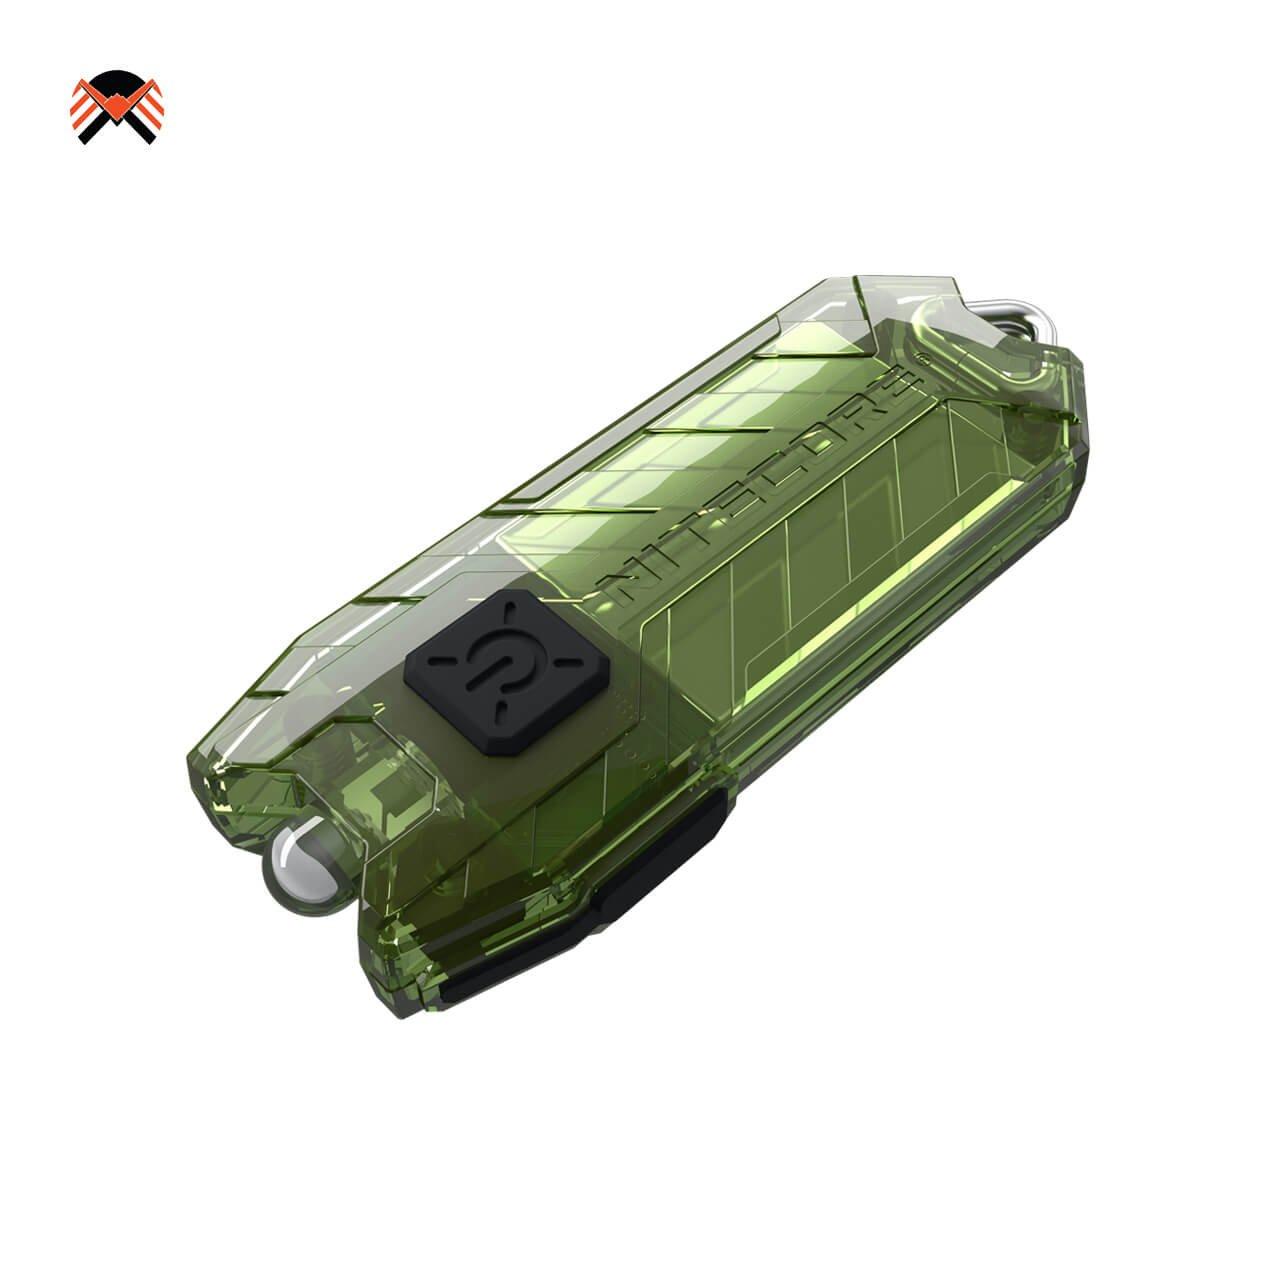 Mini Linterna Llavero Recargable USB - Recargable USB Ultra Ligera e Potente - 9.6 Gramos 48h Autonomía Certificado 45 Lúmenes Li-Ion Incorporado [ OLIVA ] Manventure